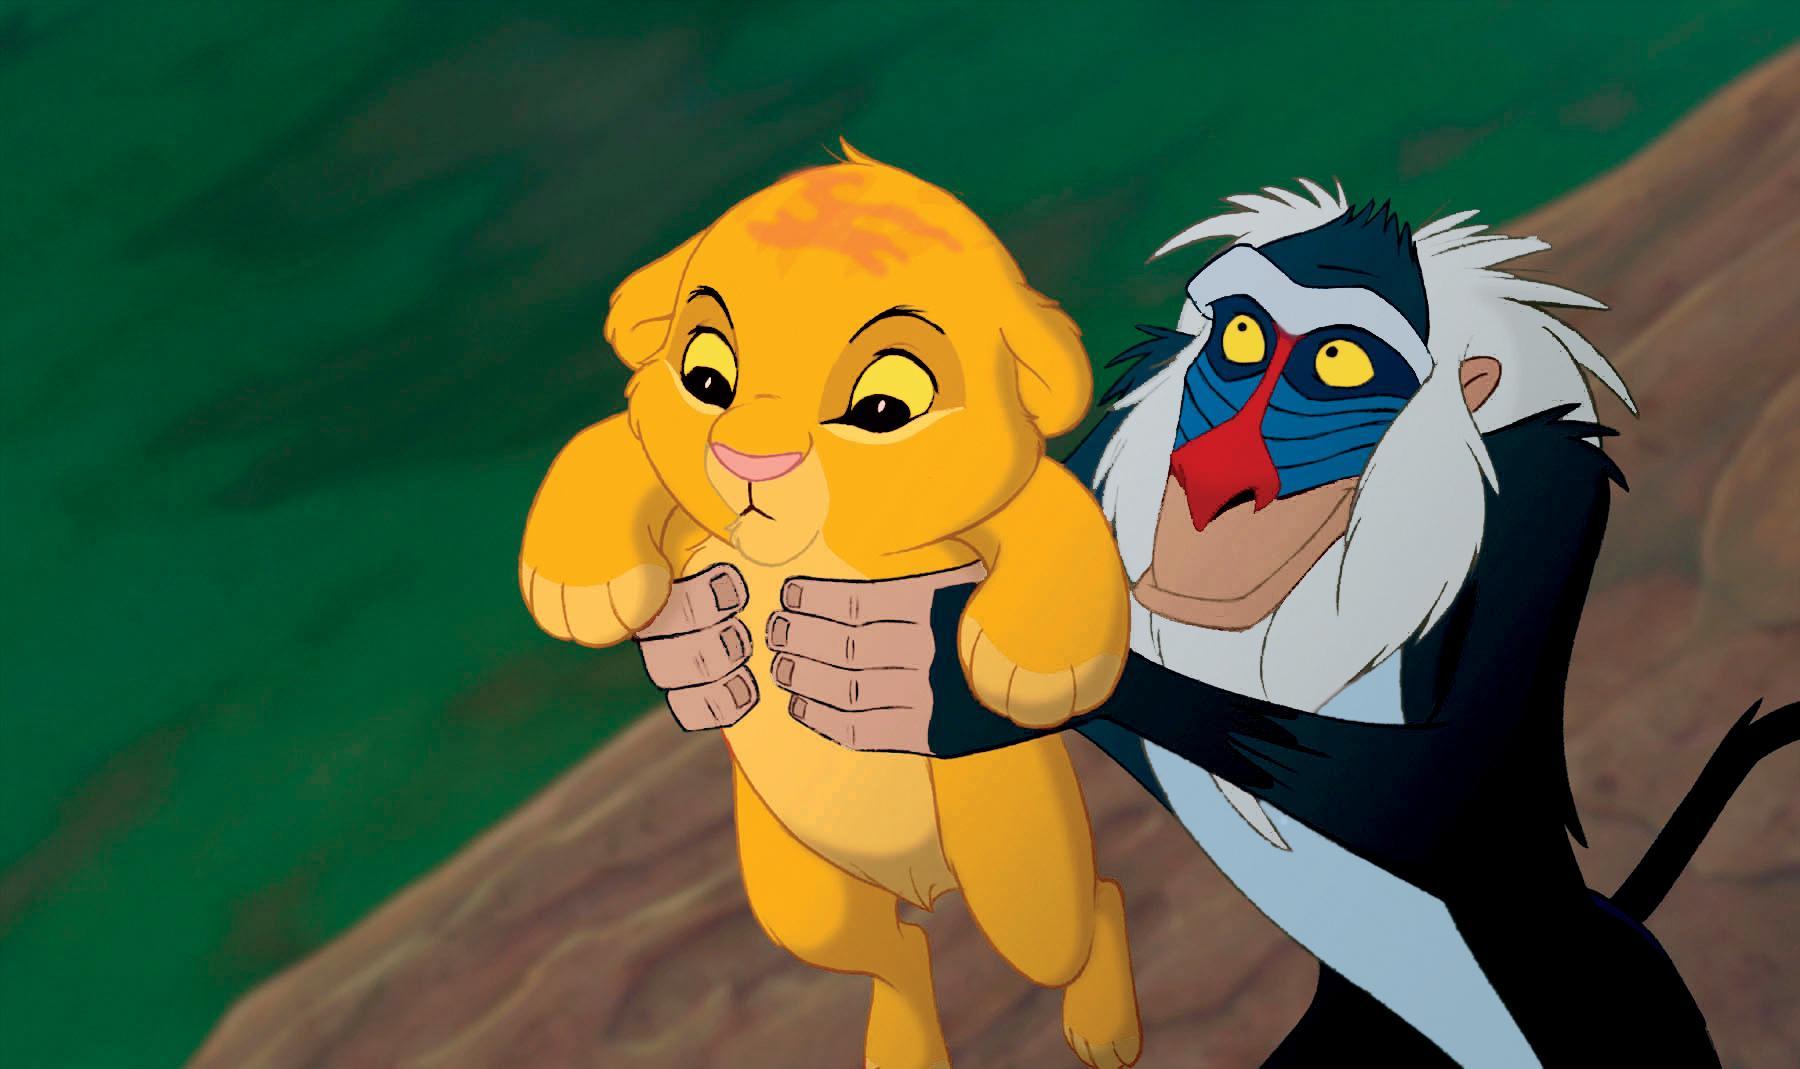 images-of-lion-king.jpg